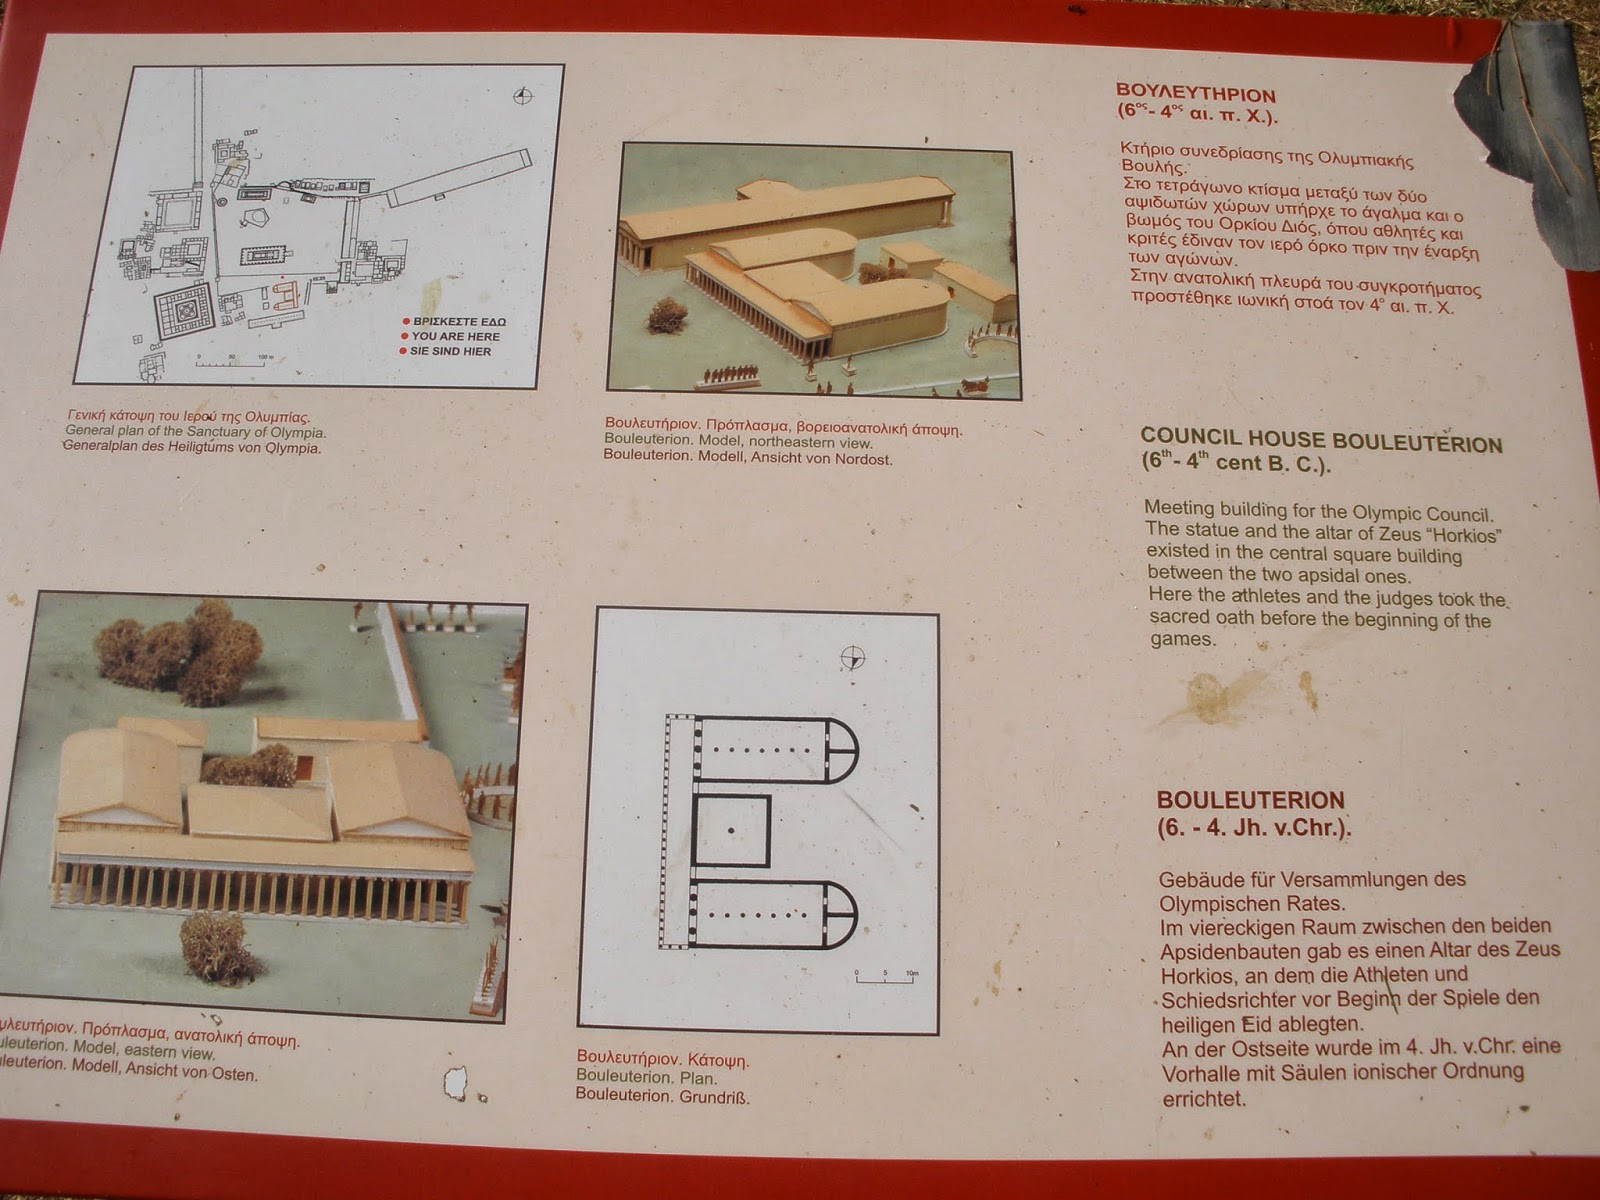 Plano Bouleuterion